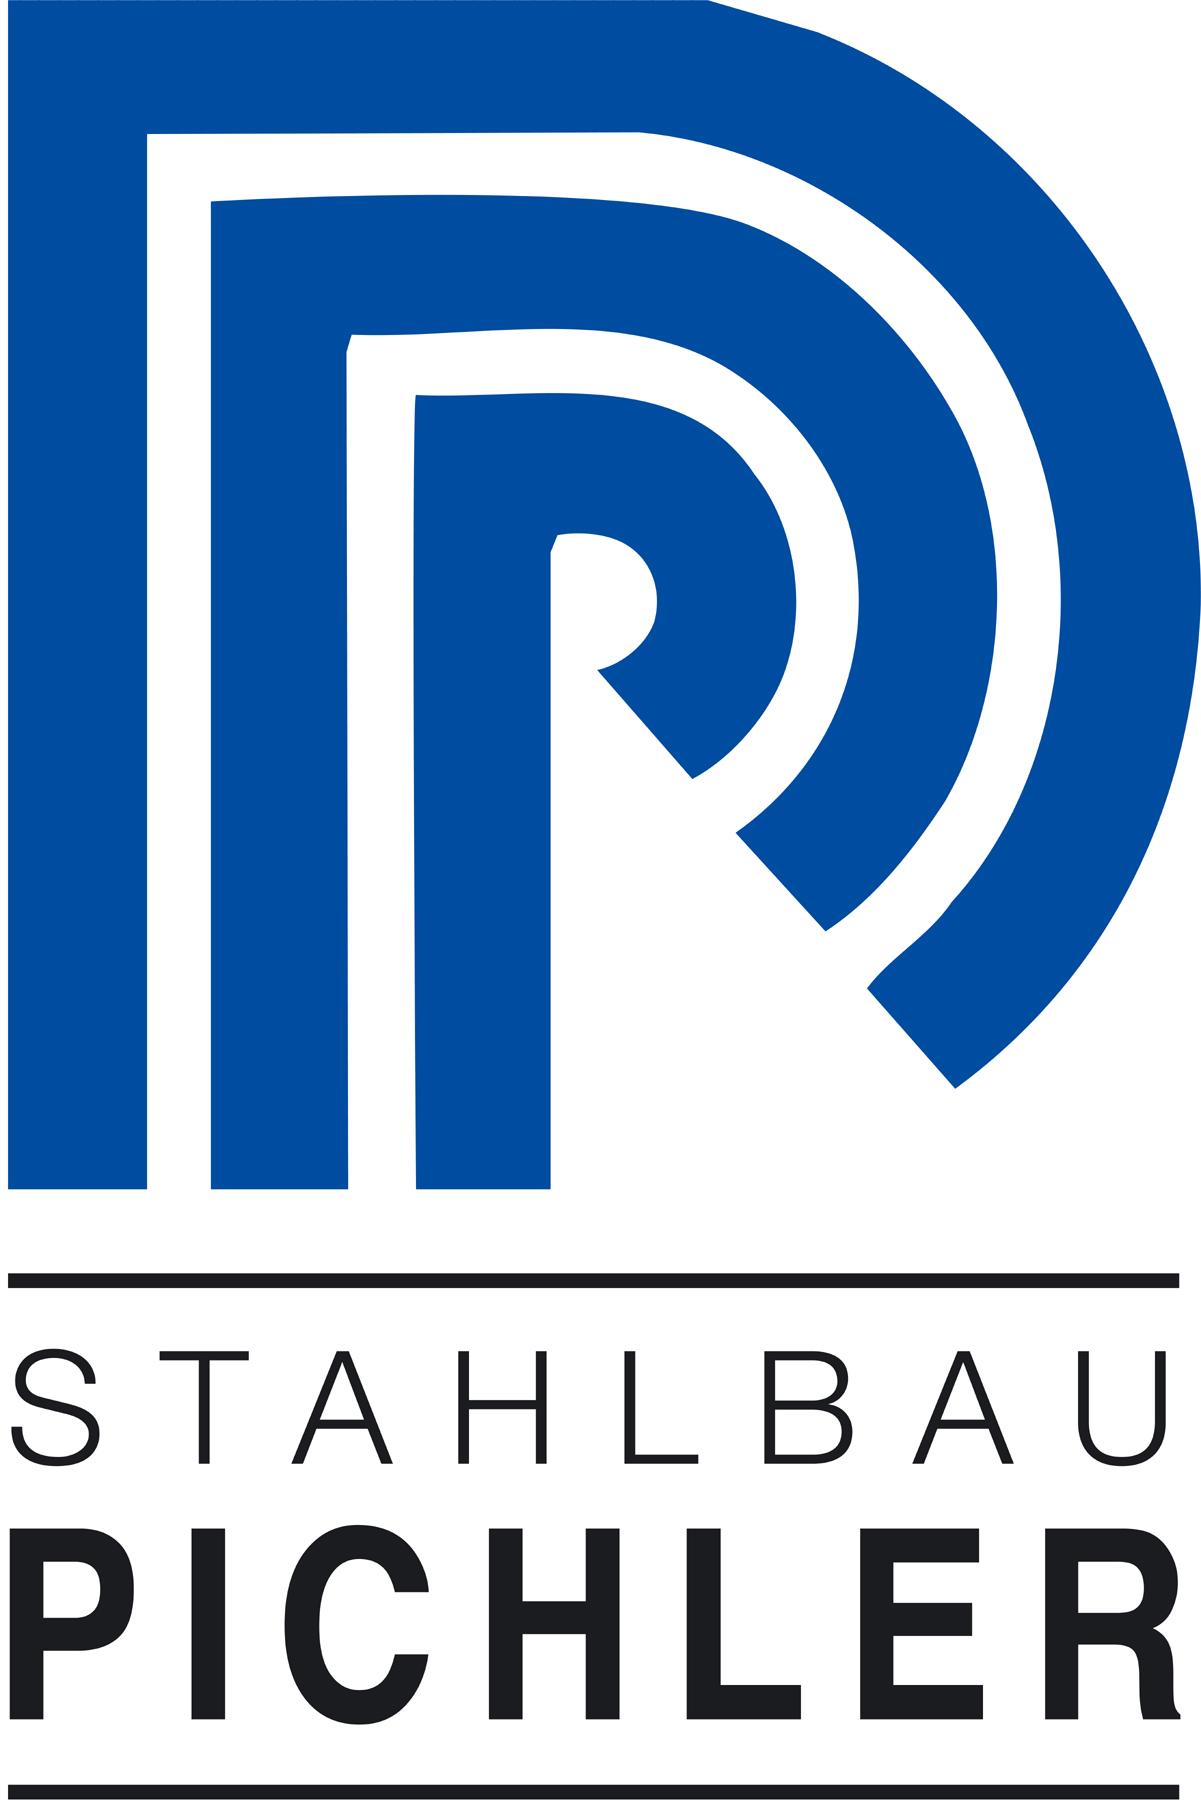 Stahlbau-pichler Logo_klein